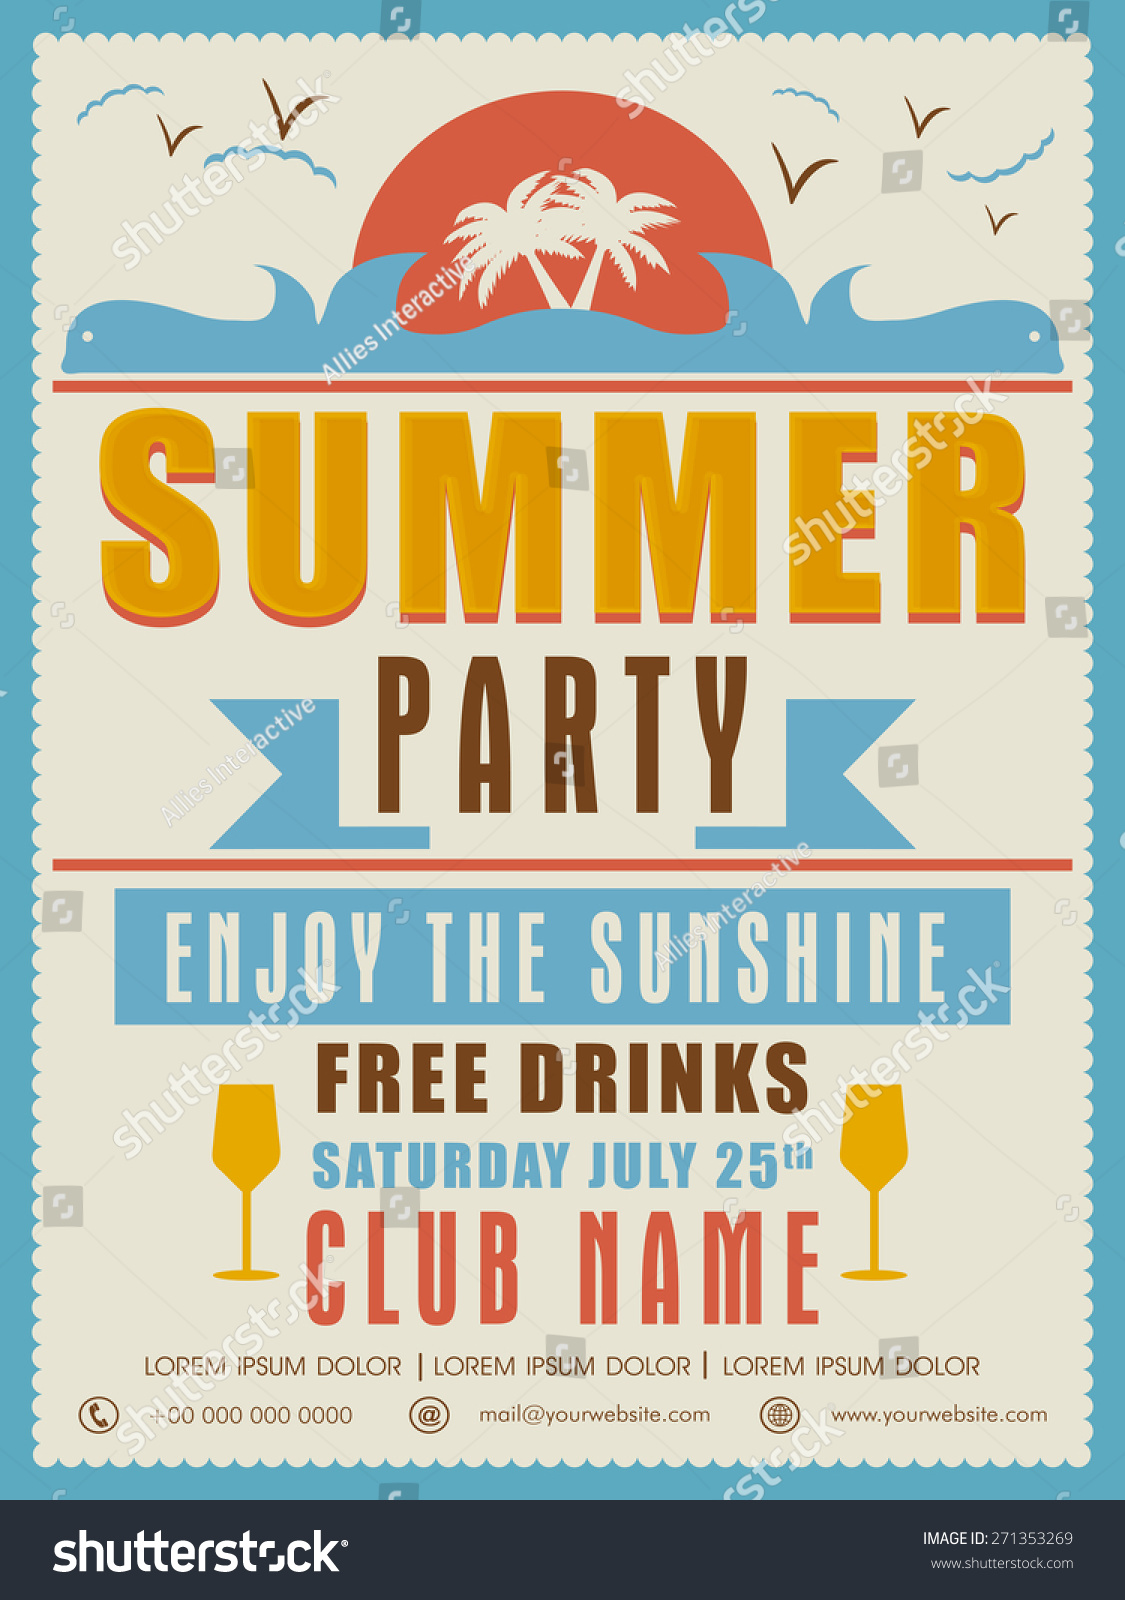 Vintage Summer Party Invitation Card Design Stock Vector 271353269 ...